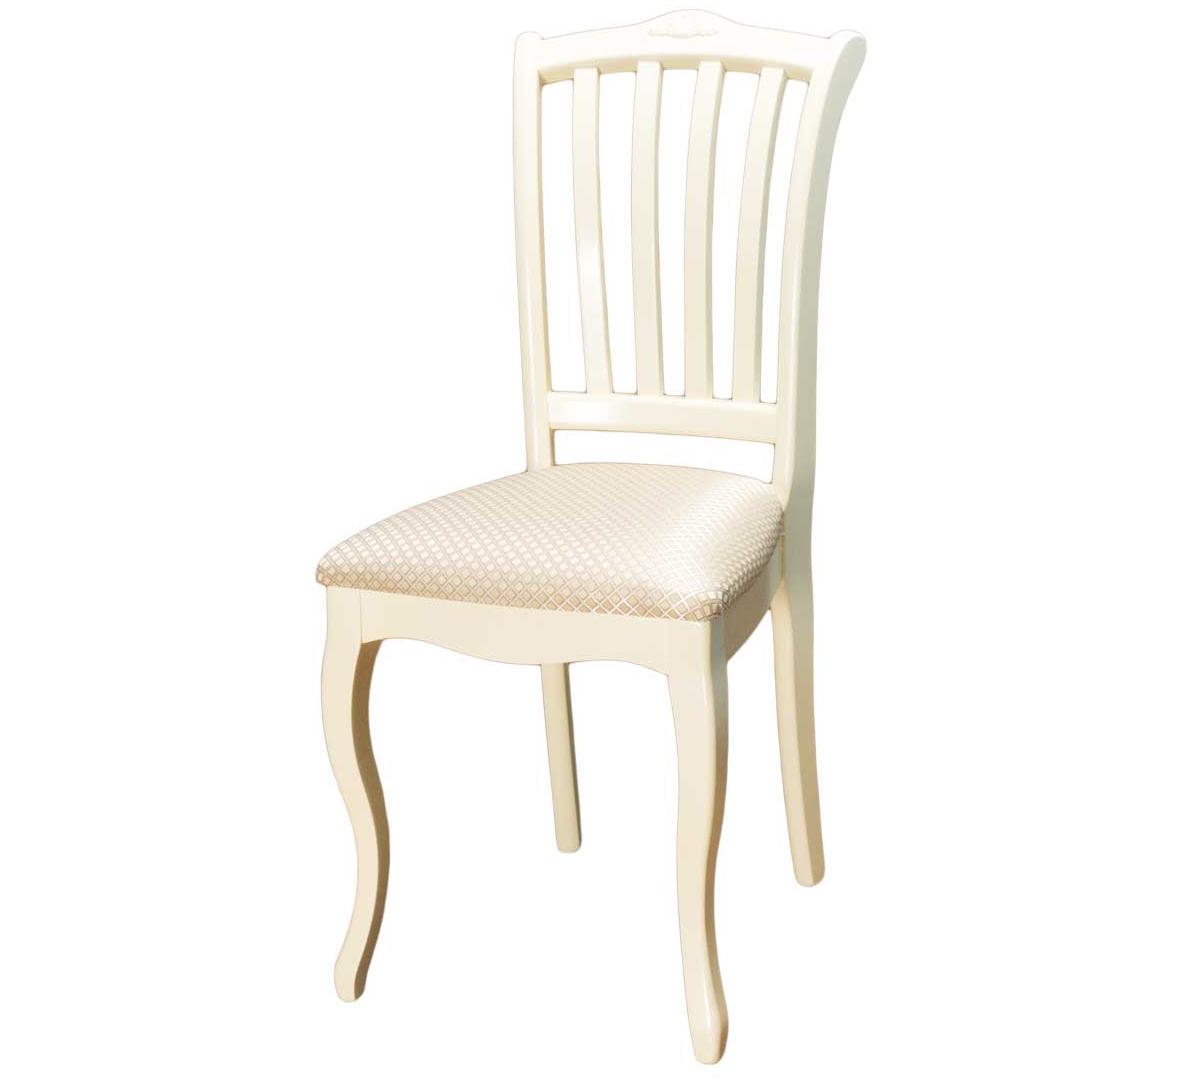 Бежевый деревянный стул на кухню (арт. М3211)